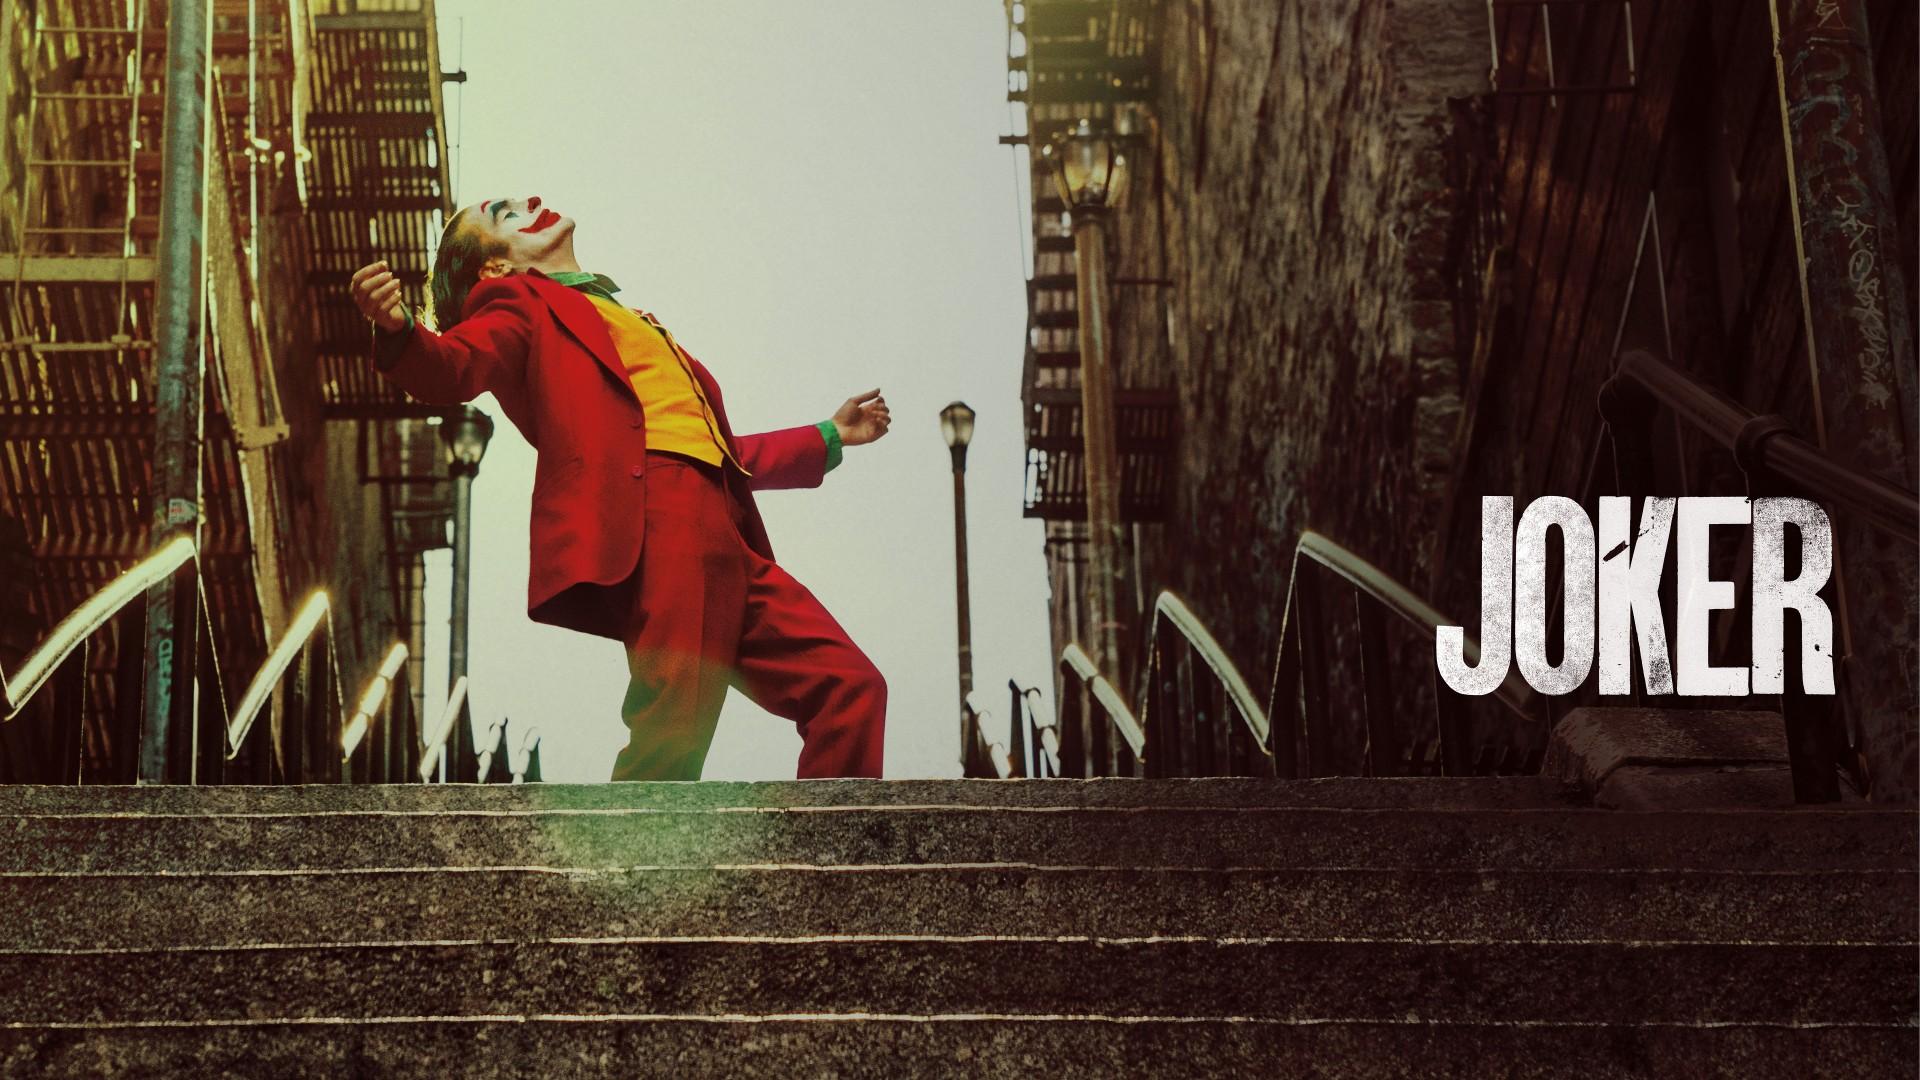 Wallpaper Joker 2019 Movie Joaquin Phoenix Movies